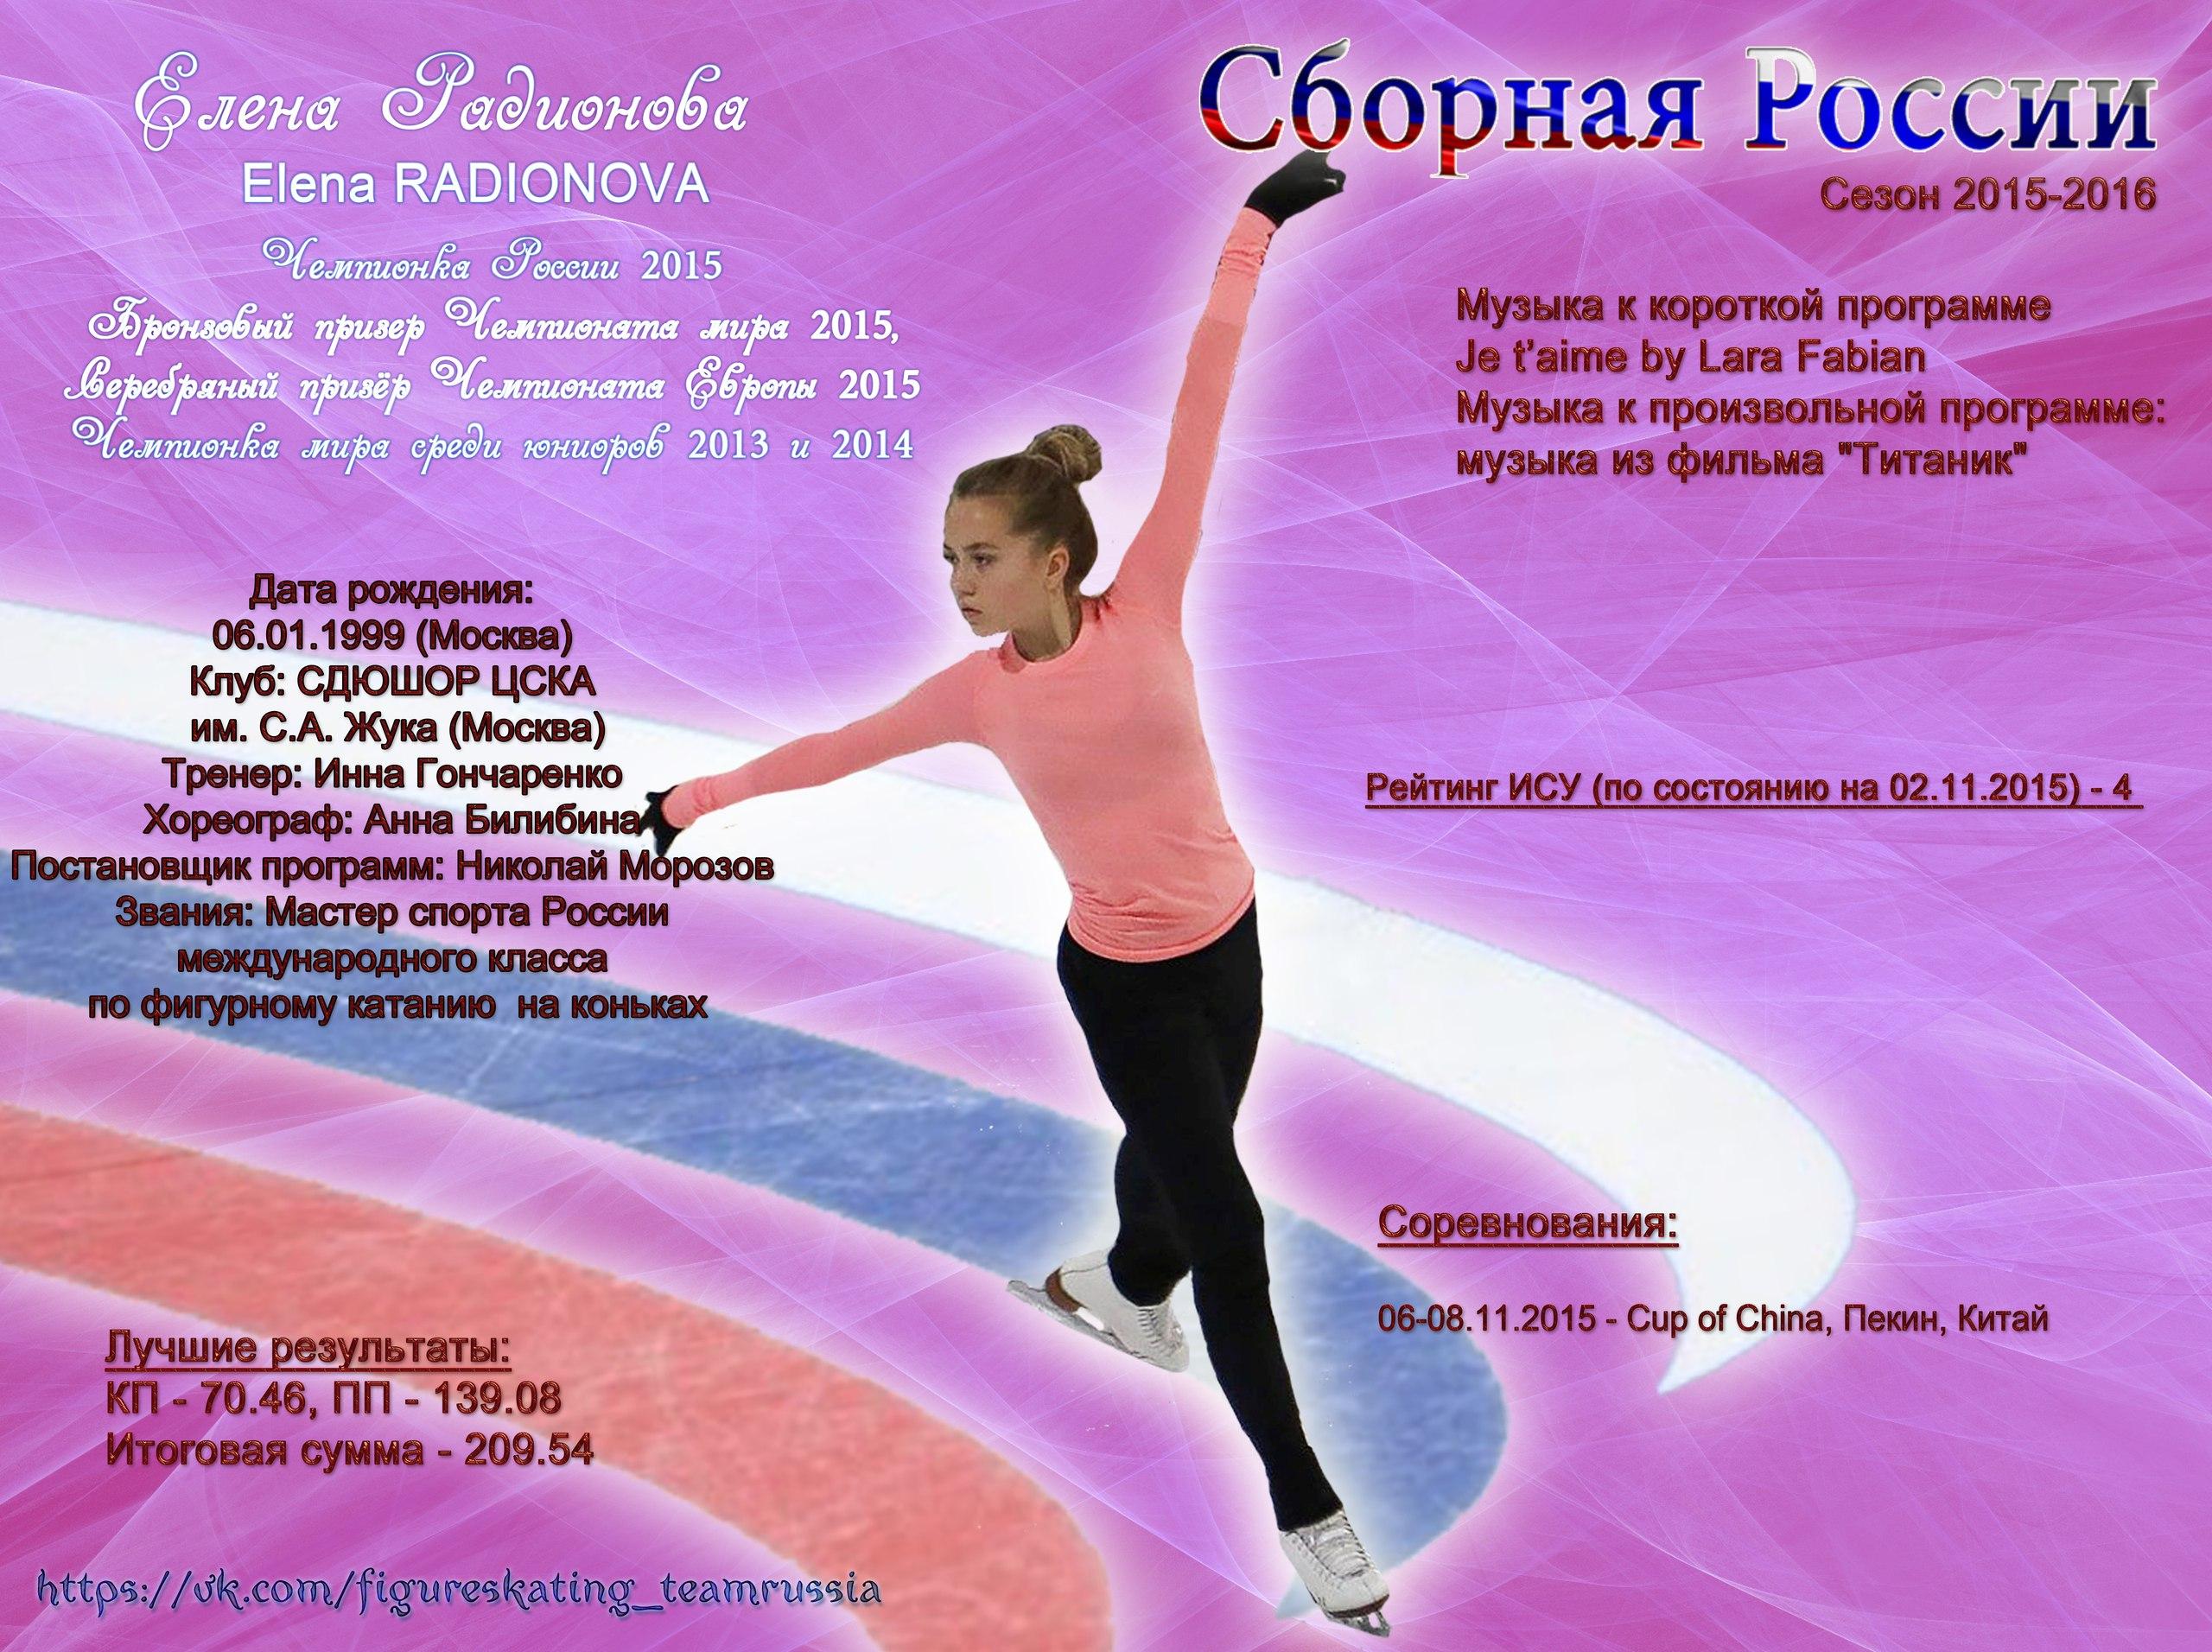 Елена Радионова - 2 - Страница 3 IH2qREpUki0